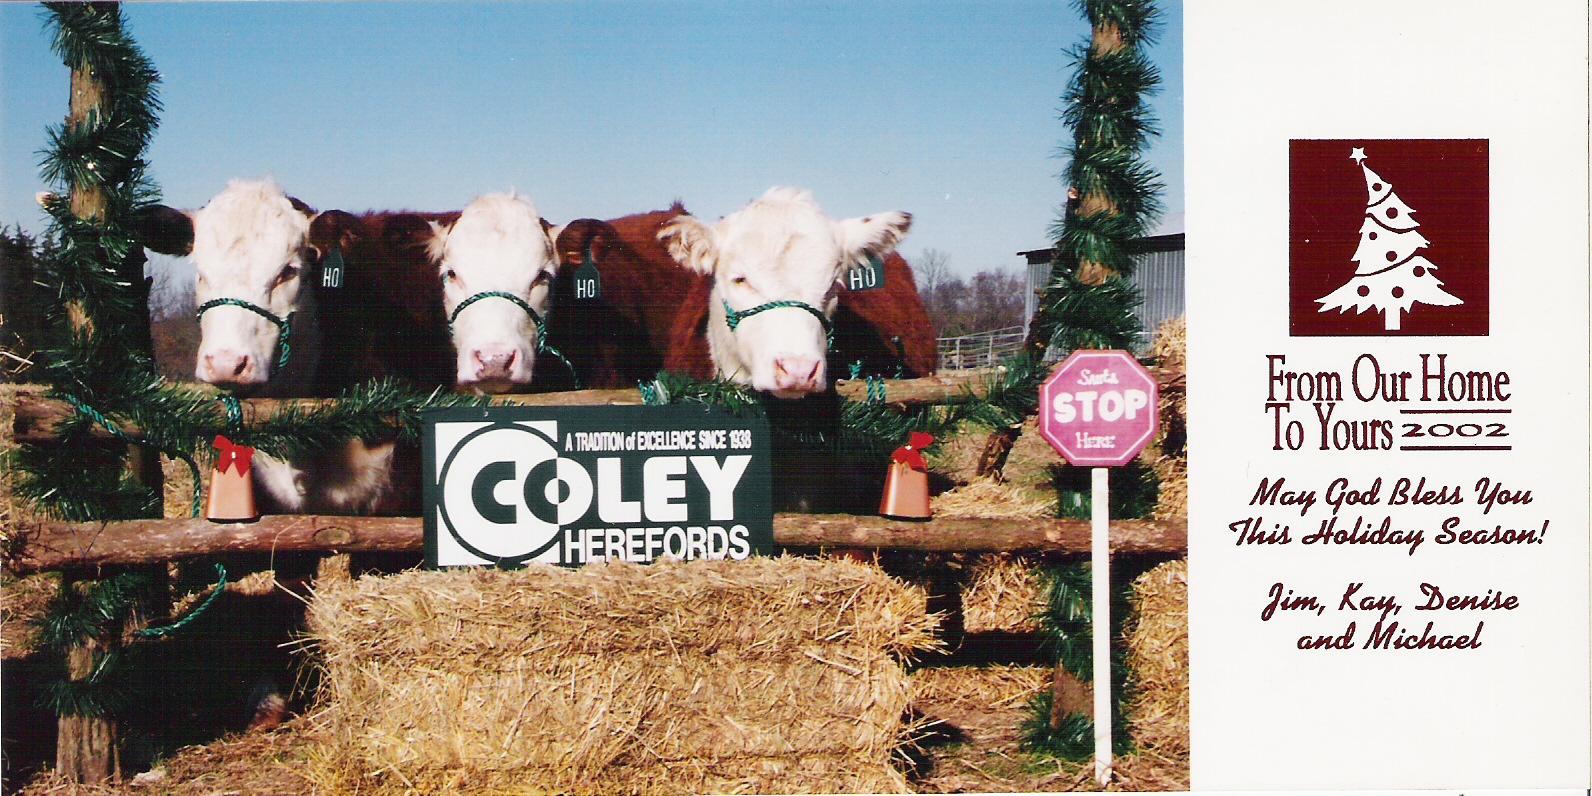 Coley Christmas card 2002